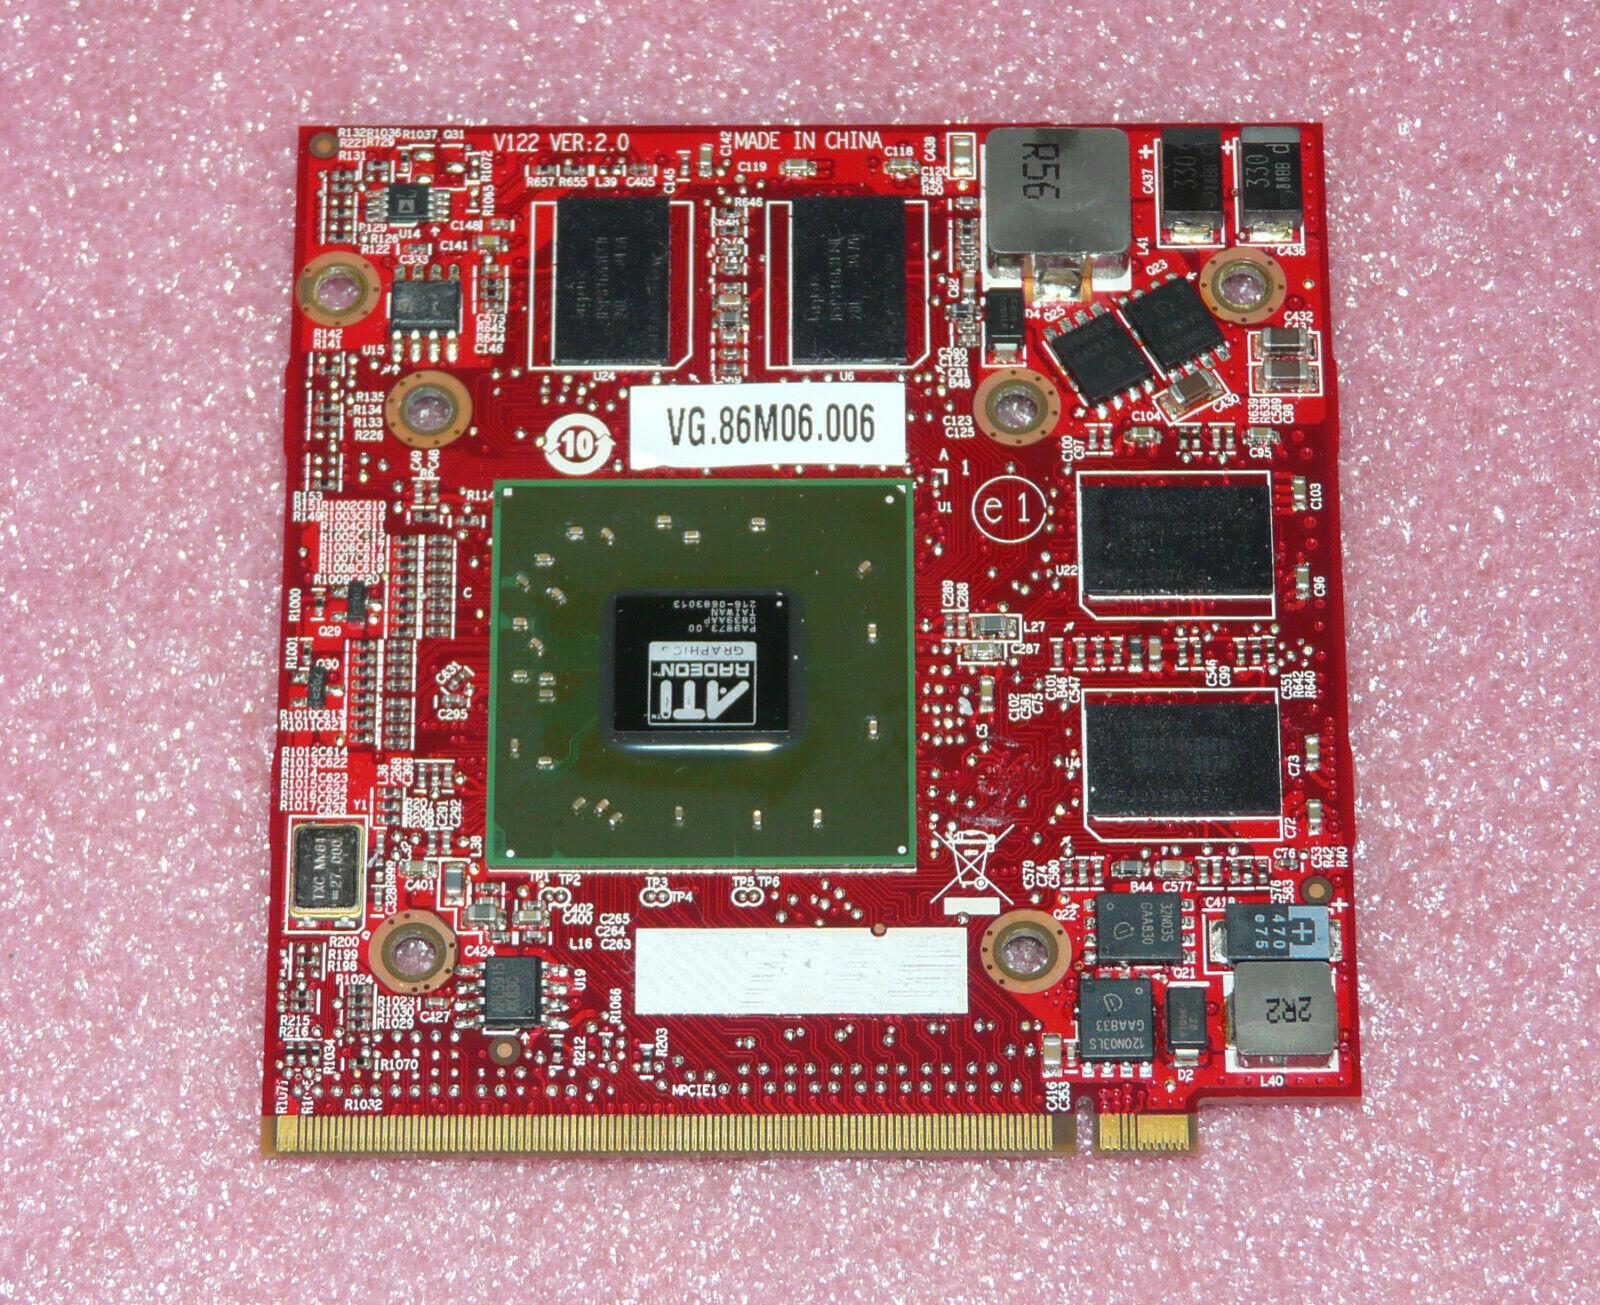 ATI Radeon HD3650 1GB VG.86M06.006 Grafikkarte Acer Aspire 6530G 6930G 8530G